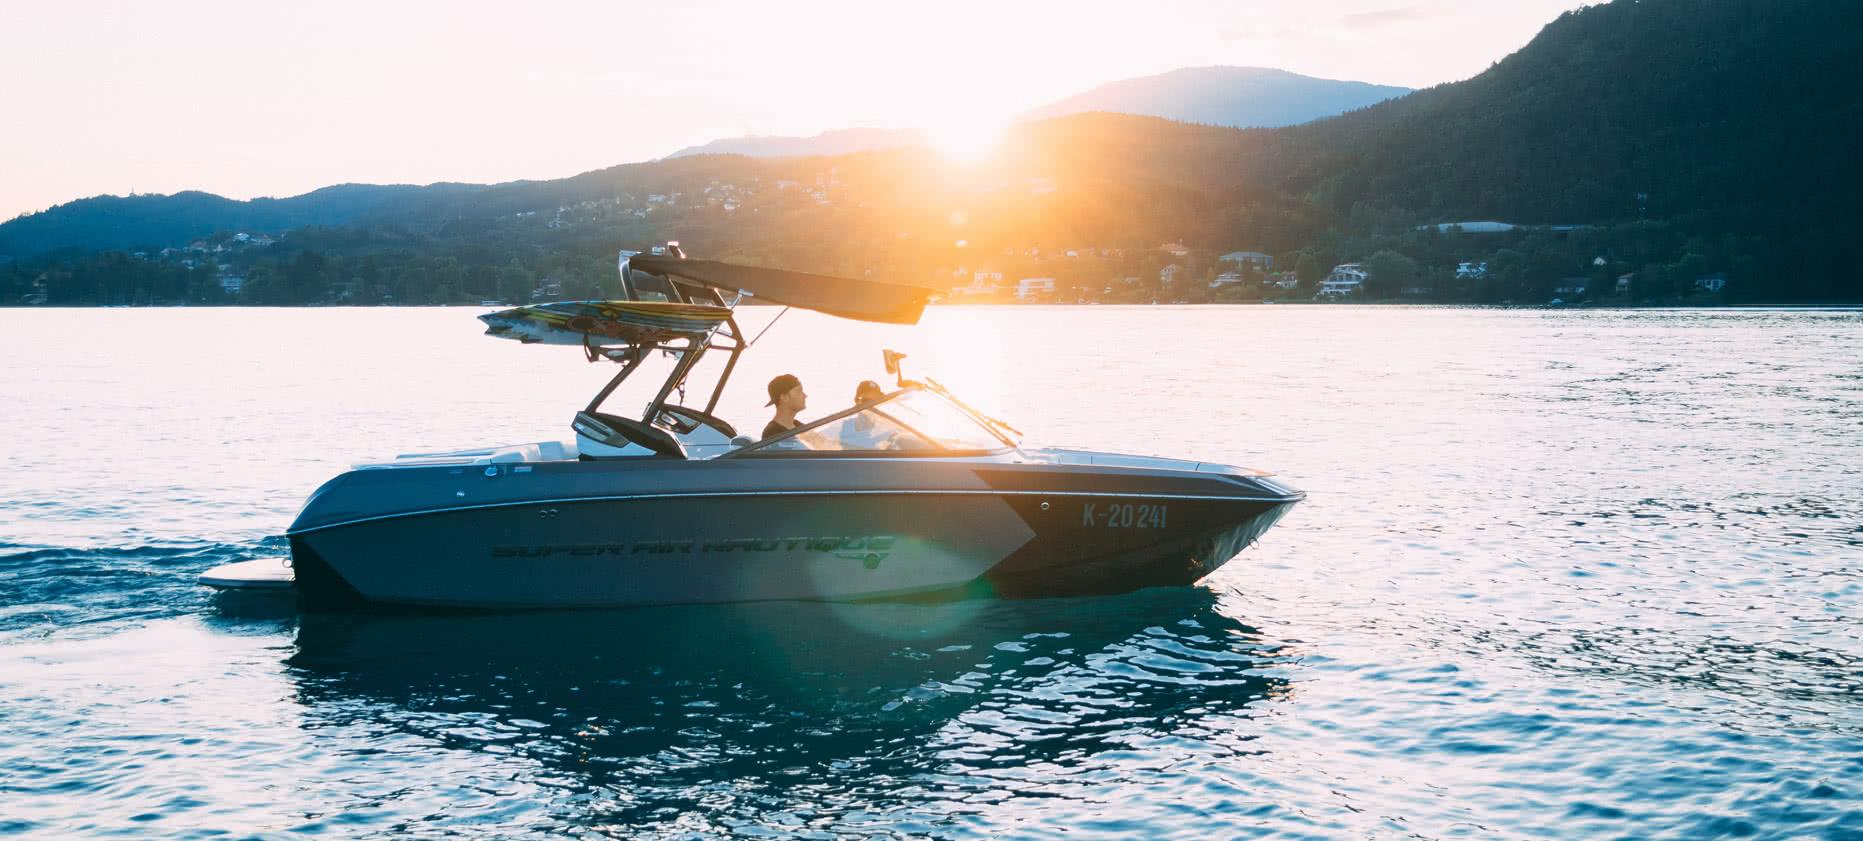 SVB Yacht Charter Checklist